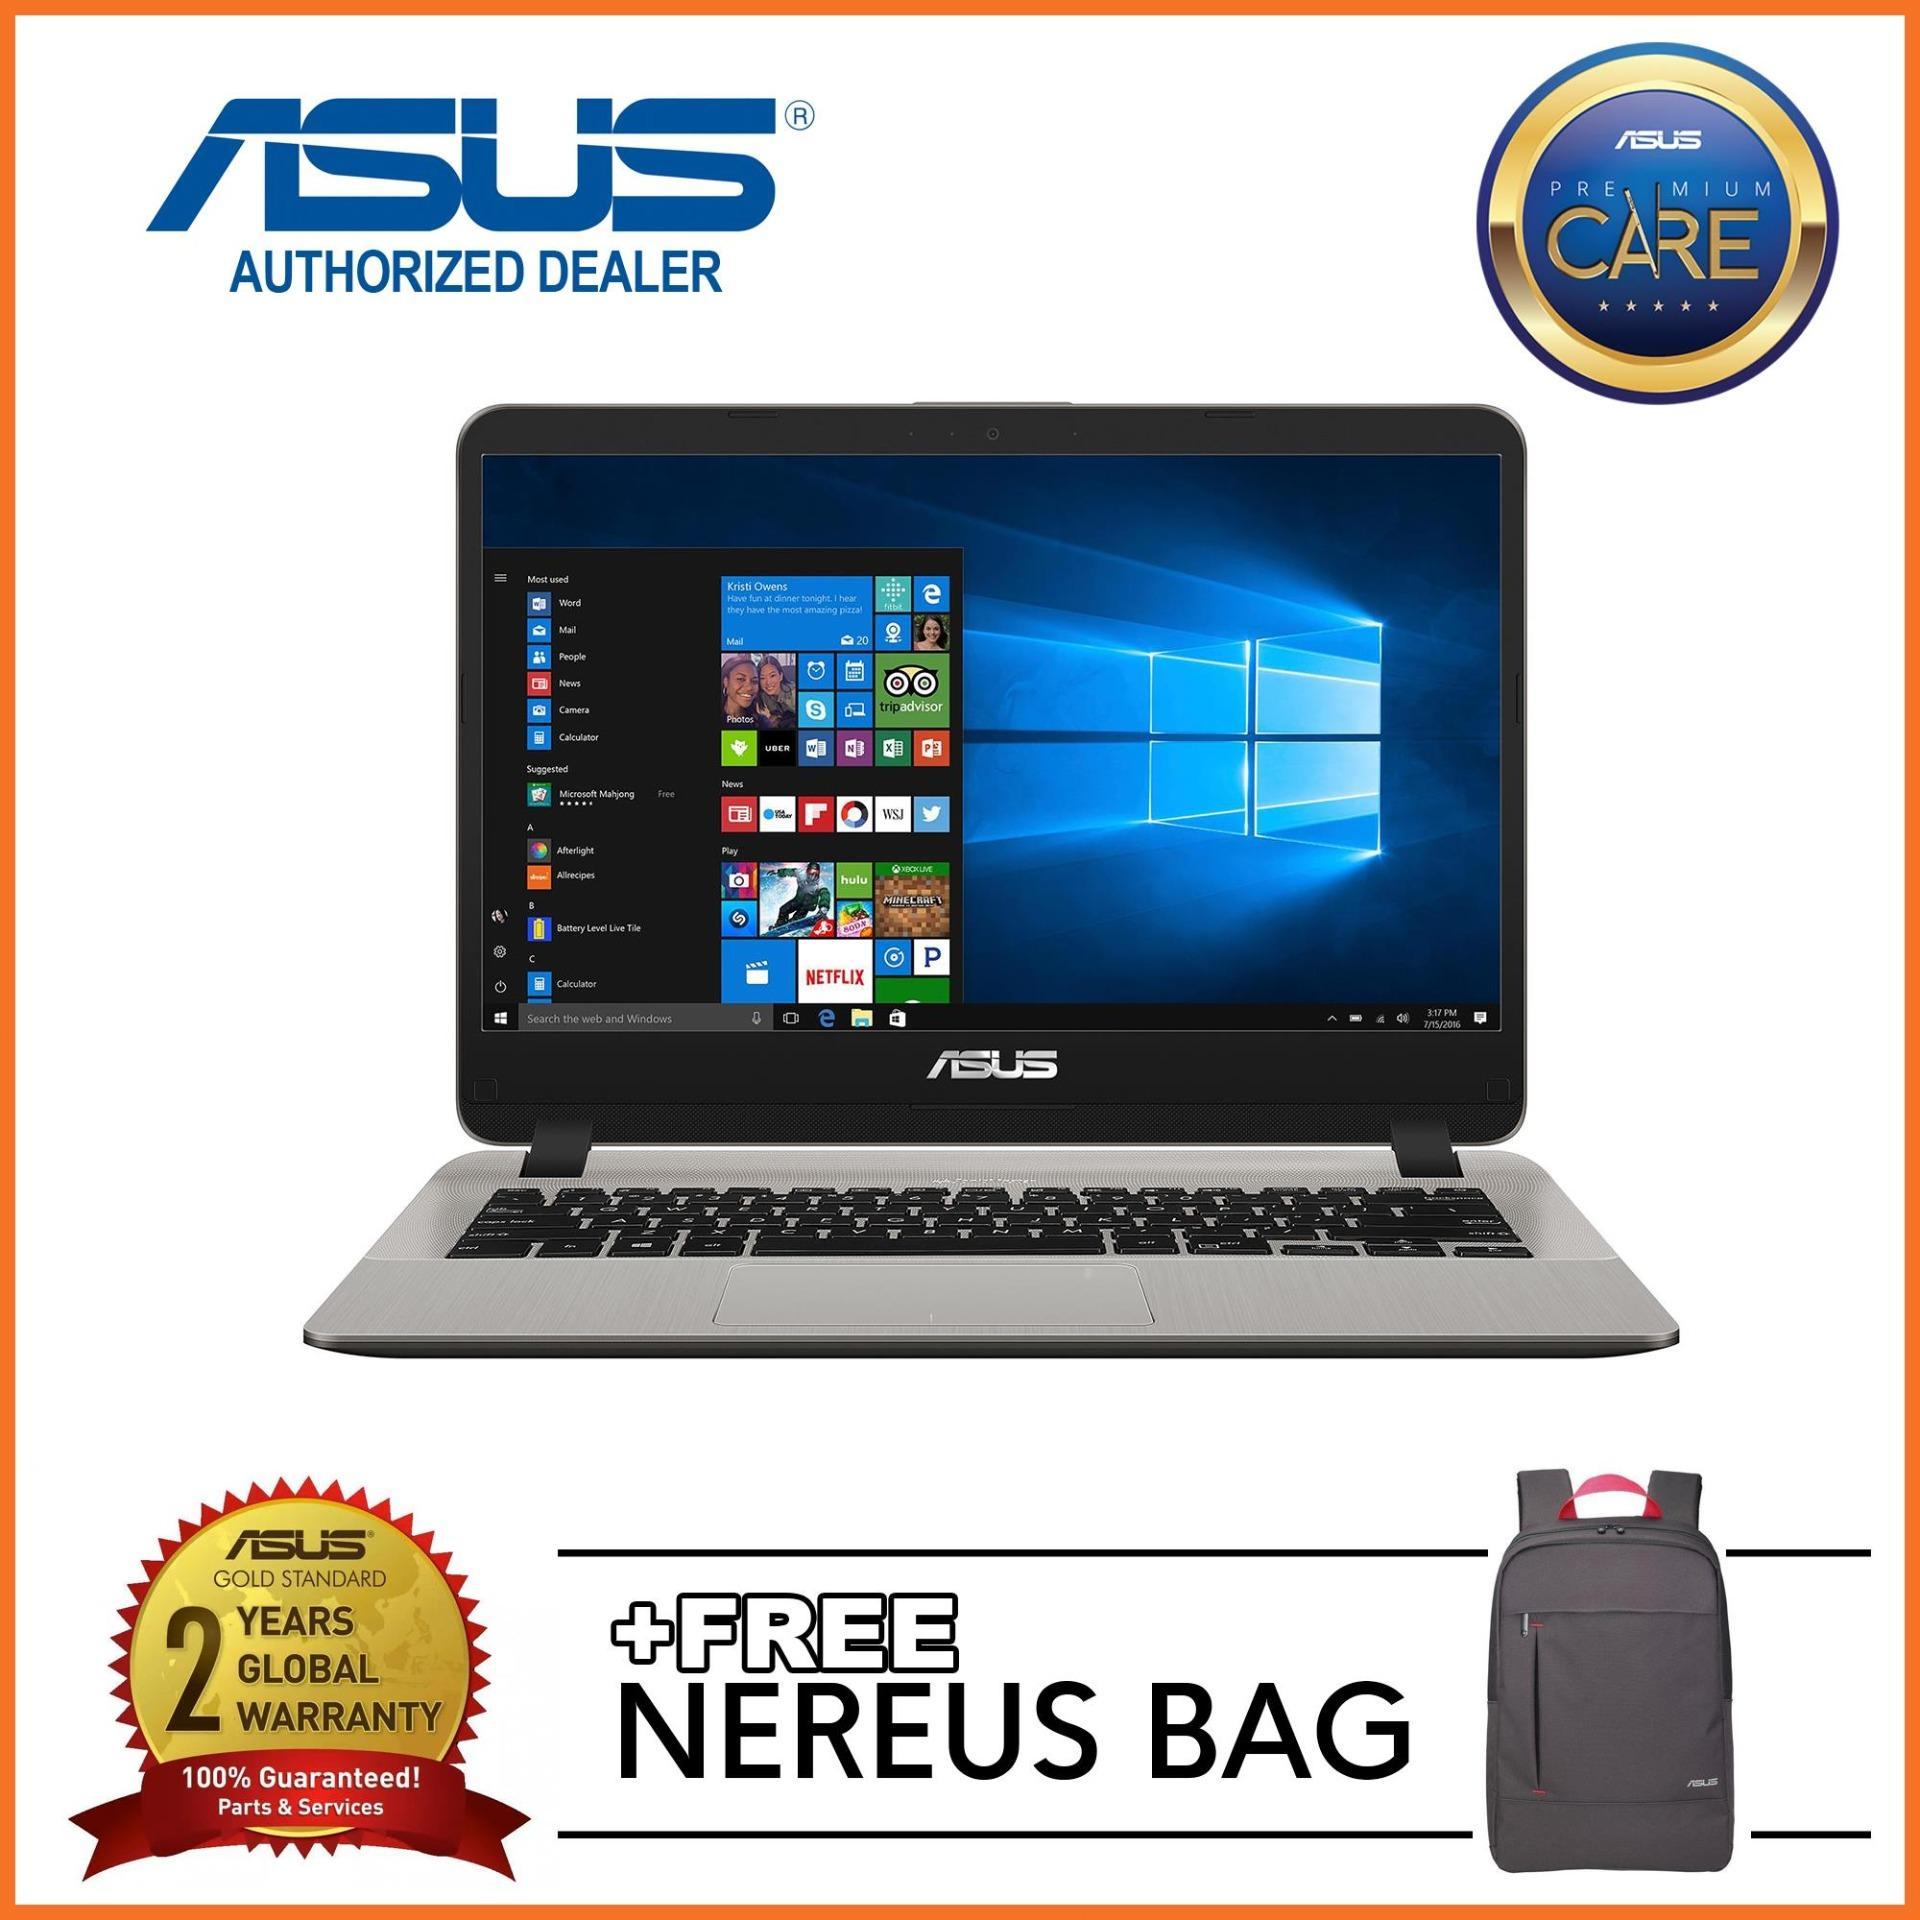 Laptop on Sale Asus X407MA-BV003T Intel Celeron QUAD Gemini Lake 4GB 500HDD